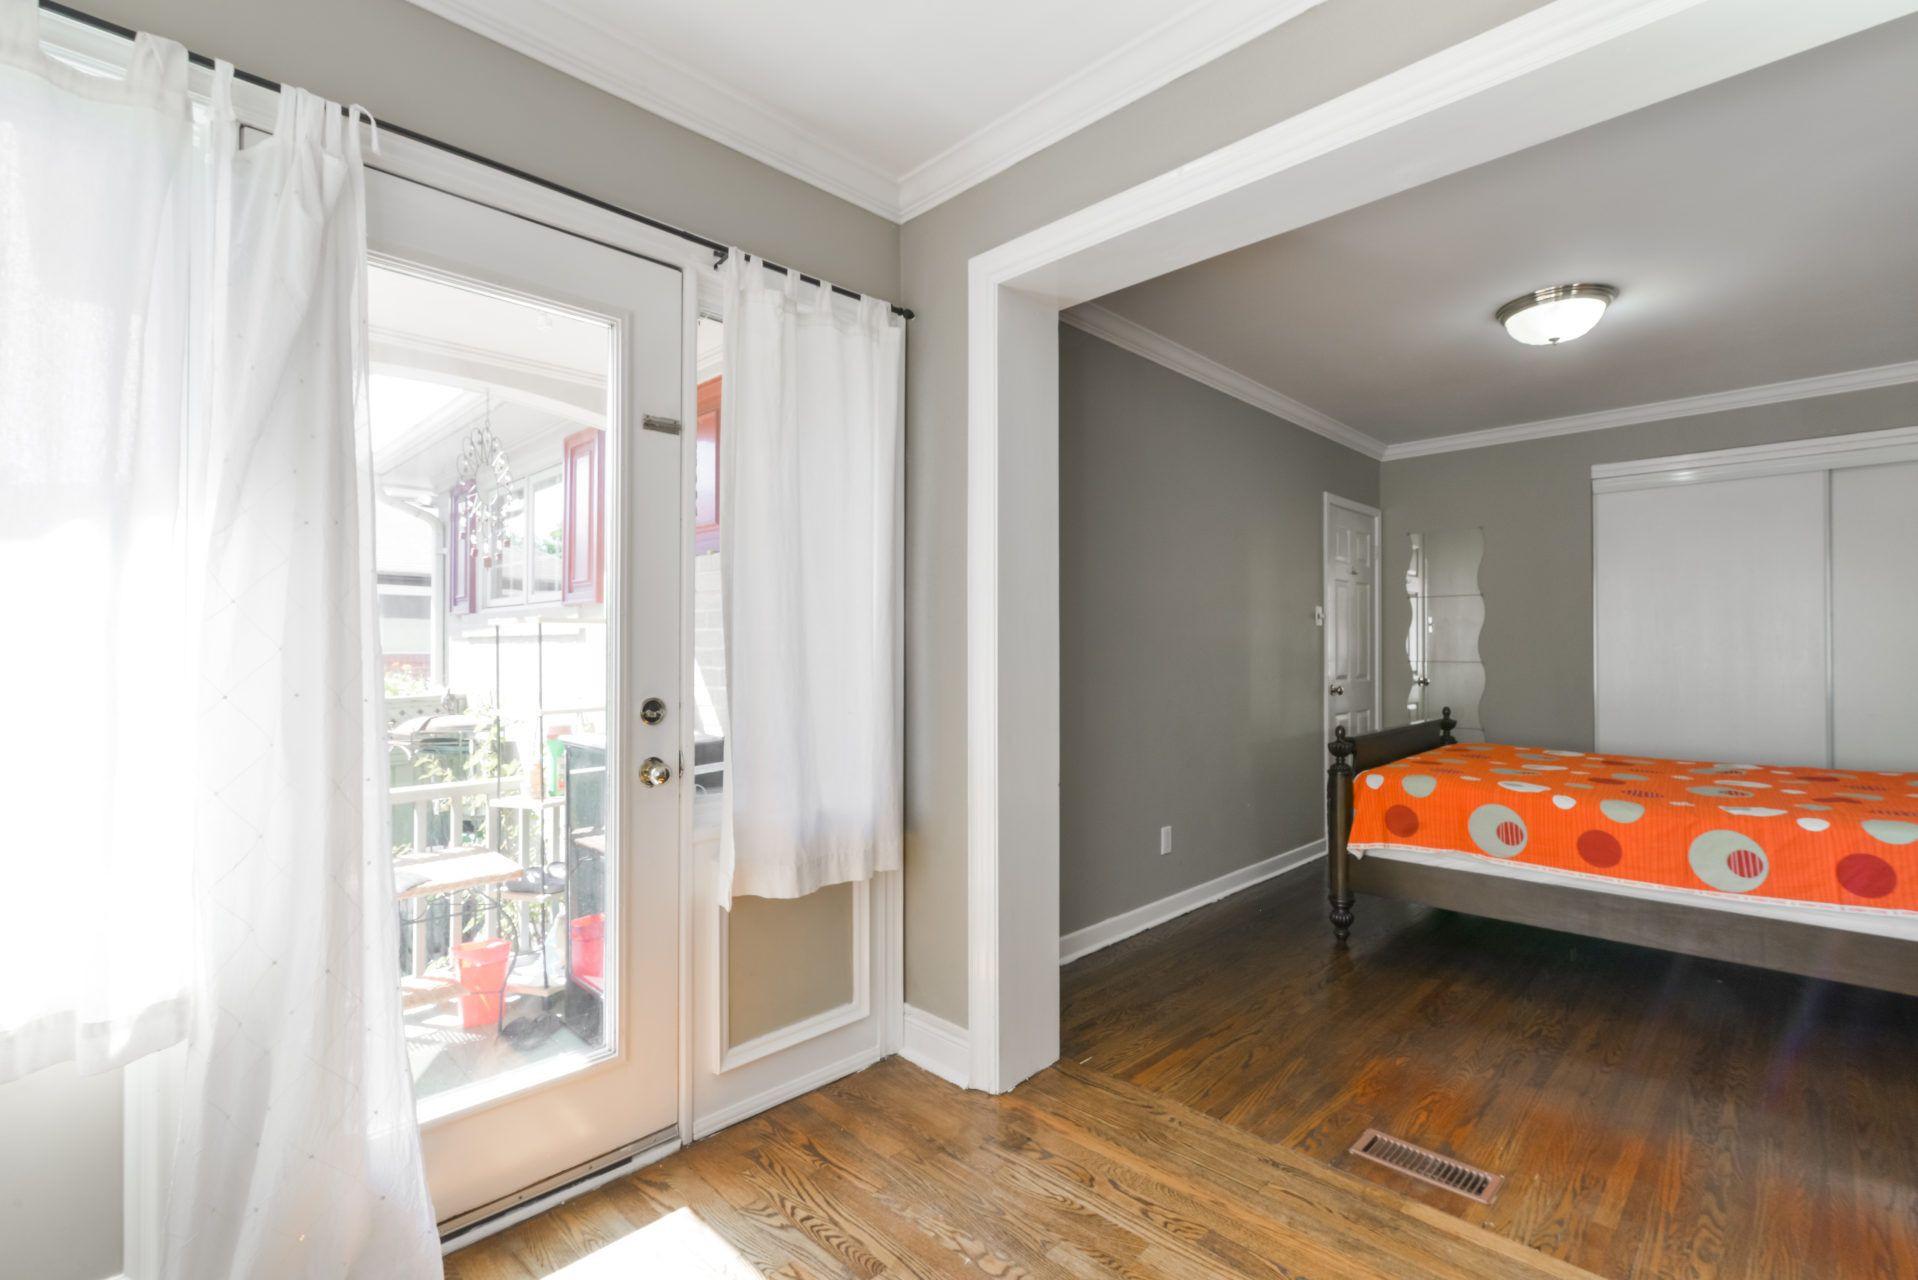 Hardwood Flooring Installation Etobicoke Of 29 Benstrow Avenue Etobicoke by Dharmeshkumar Patel Inside 133284